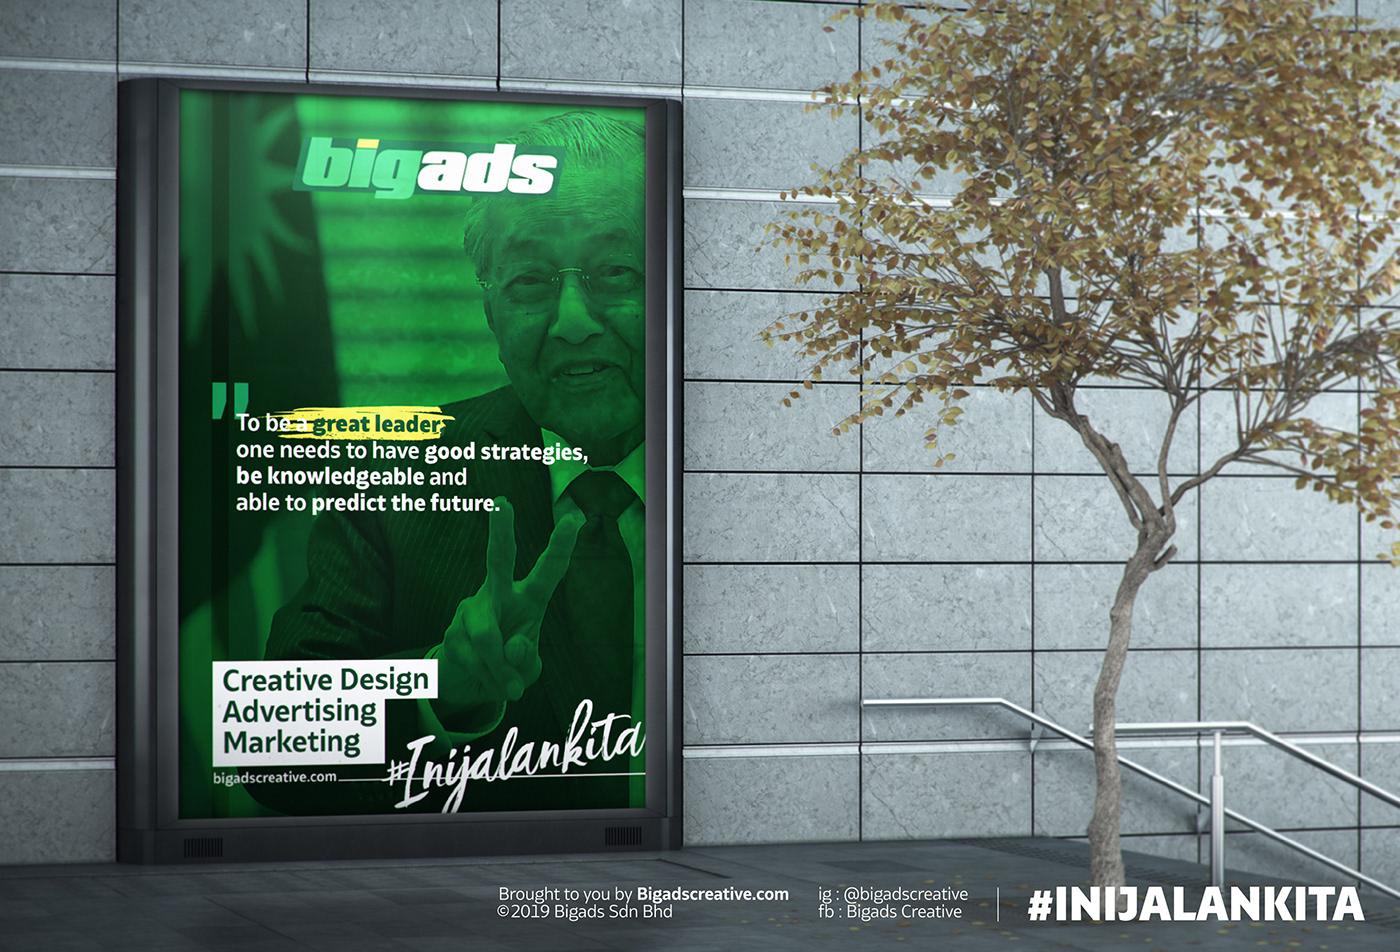 Image may contain: outdoor, screenshot and billboard